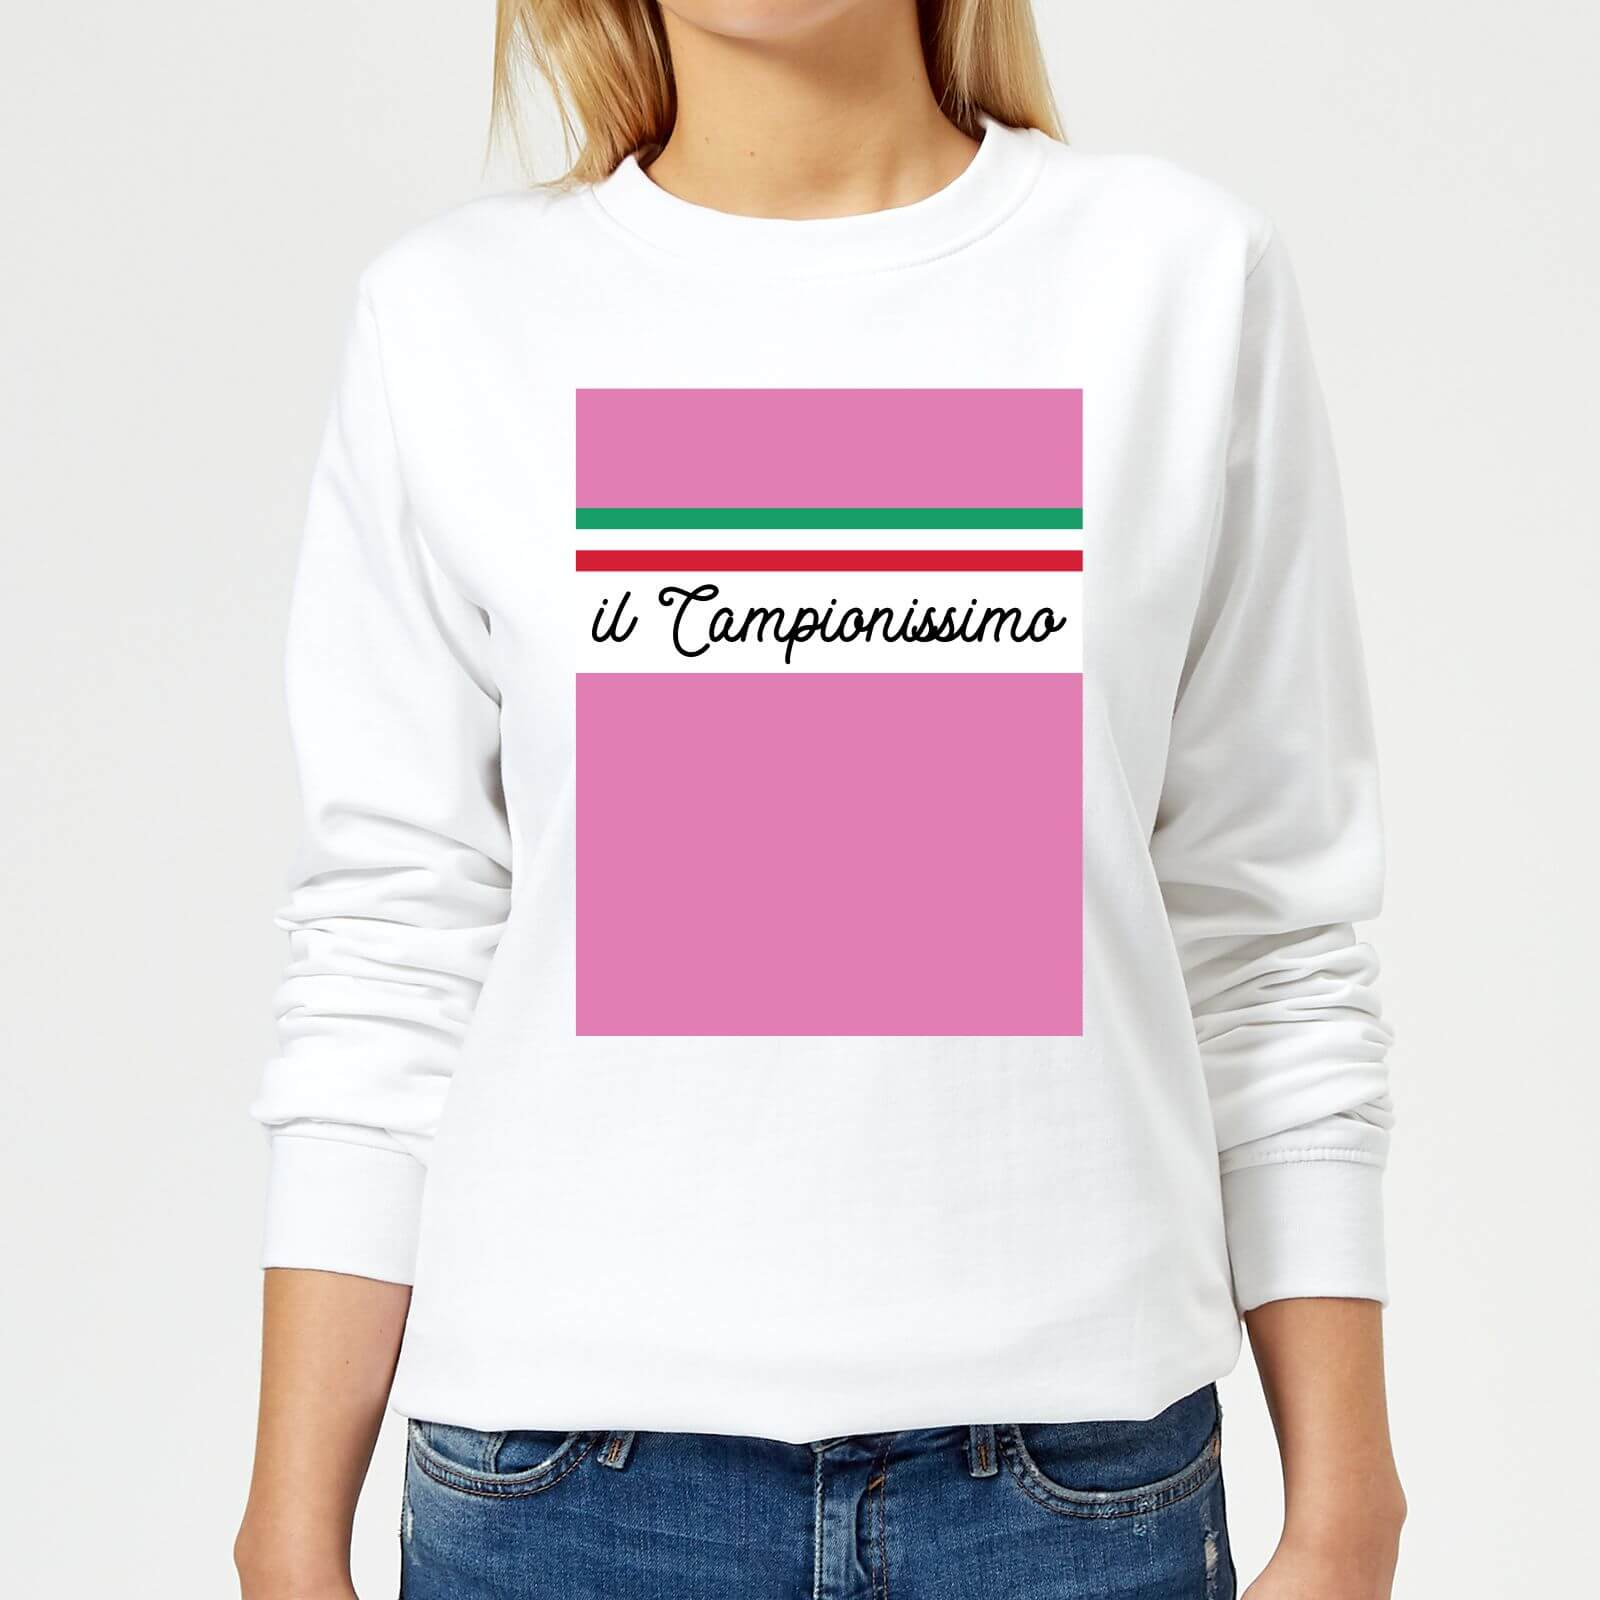 Summit Finish Il Campionissimo Women's Sweatshirt - White - XS - Weiß